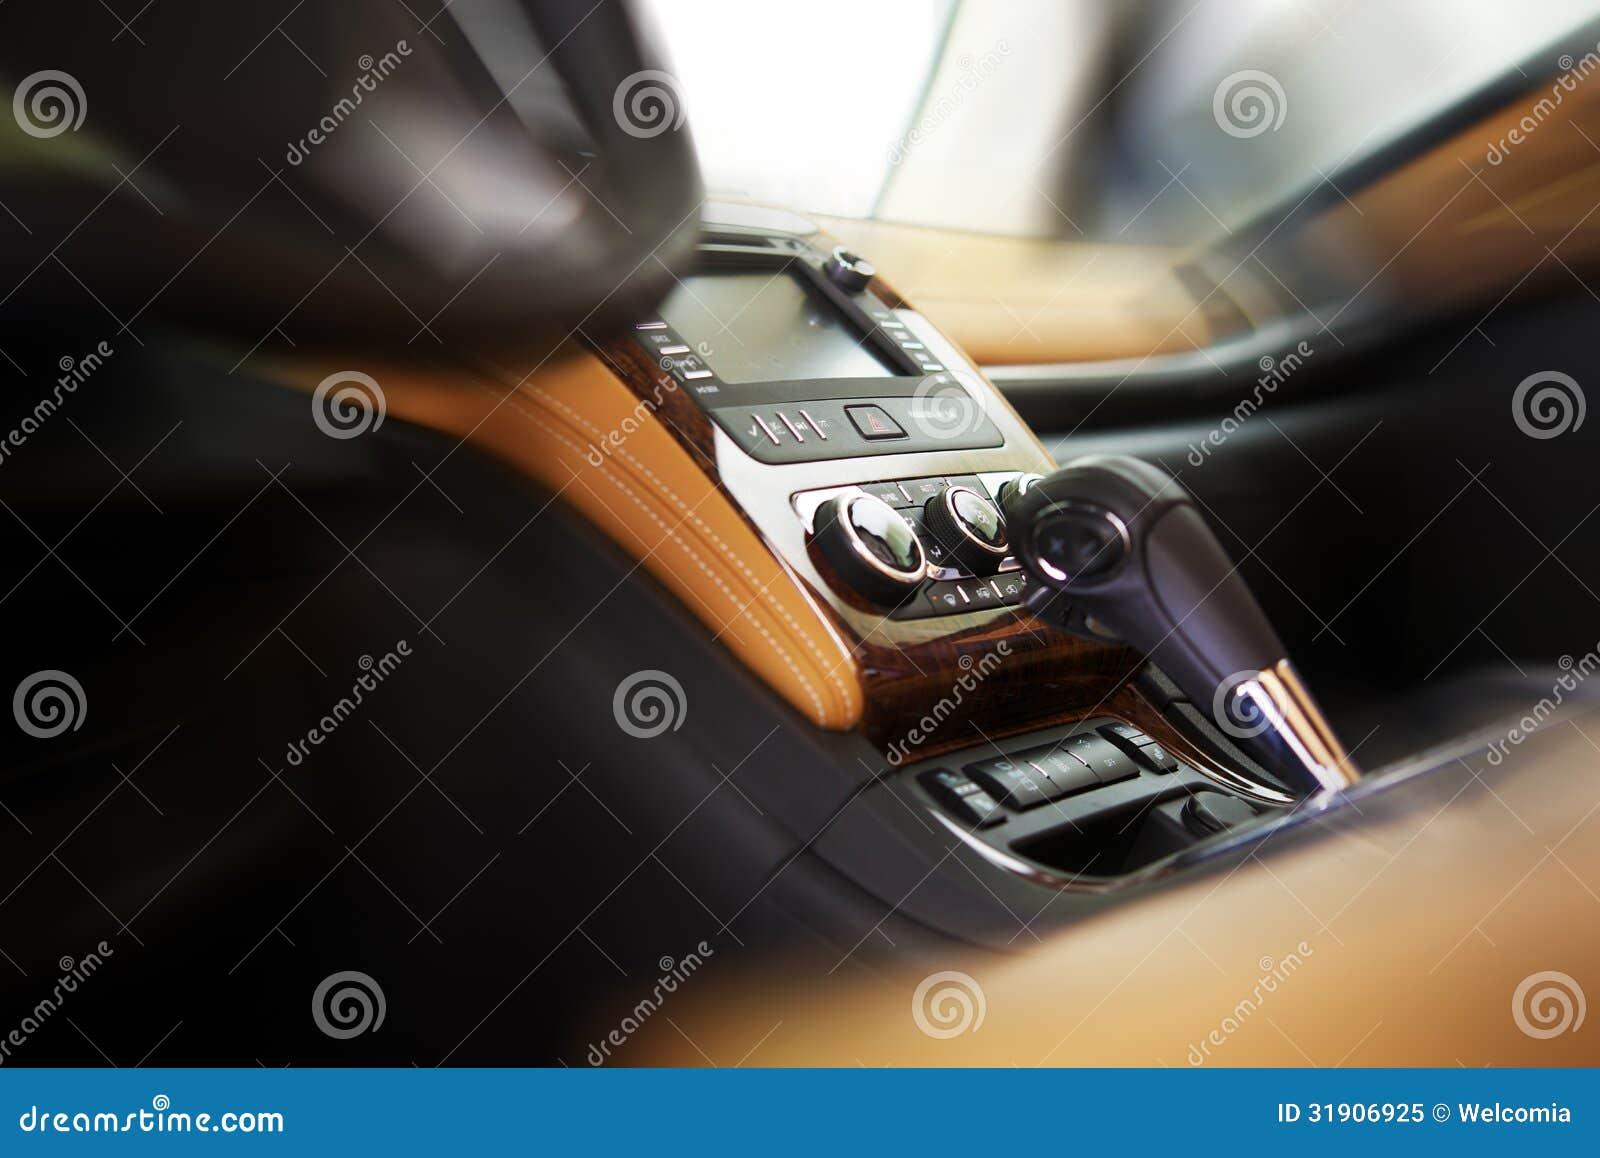 Auto-Cockpit Lizenzfreies Stockfoto - Bild: 31906925 | {Auto cockpit straße 30}